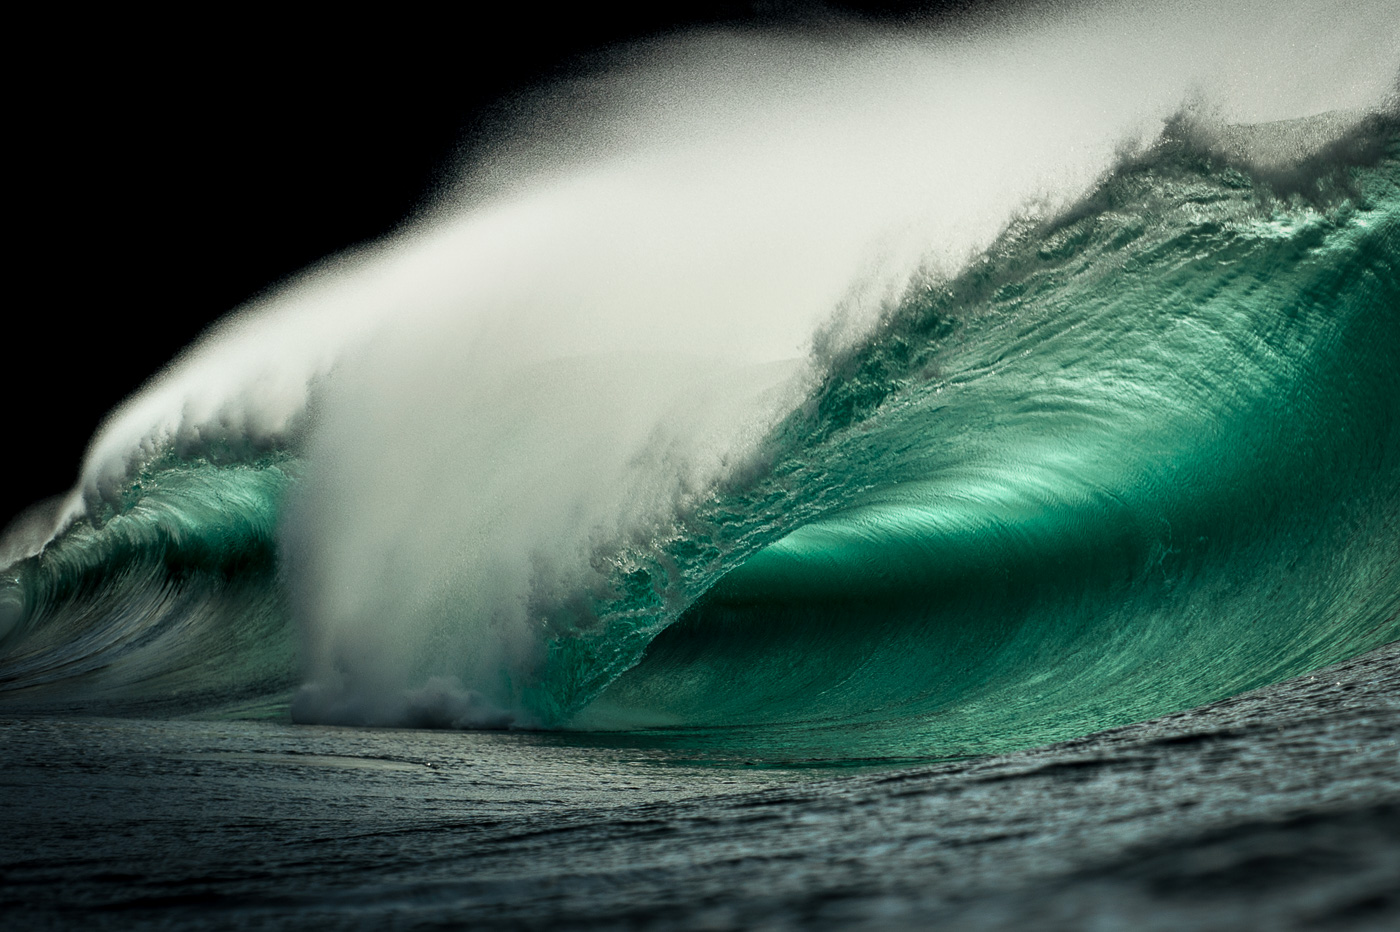 Riley's Irish wave